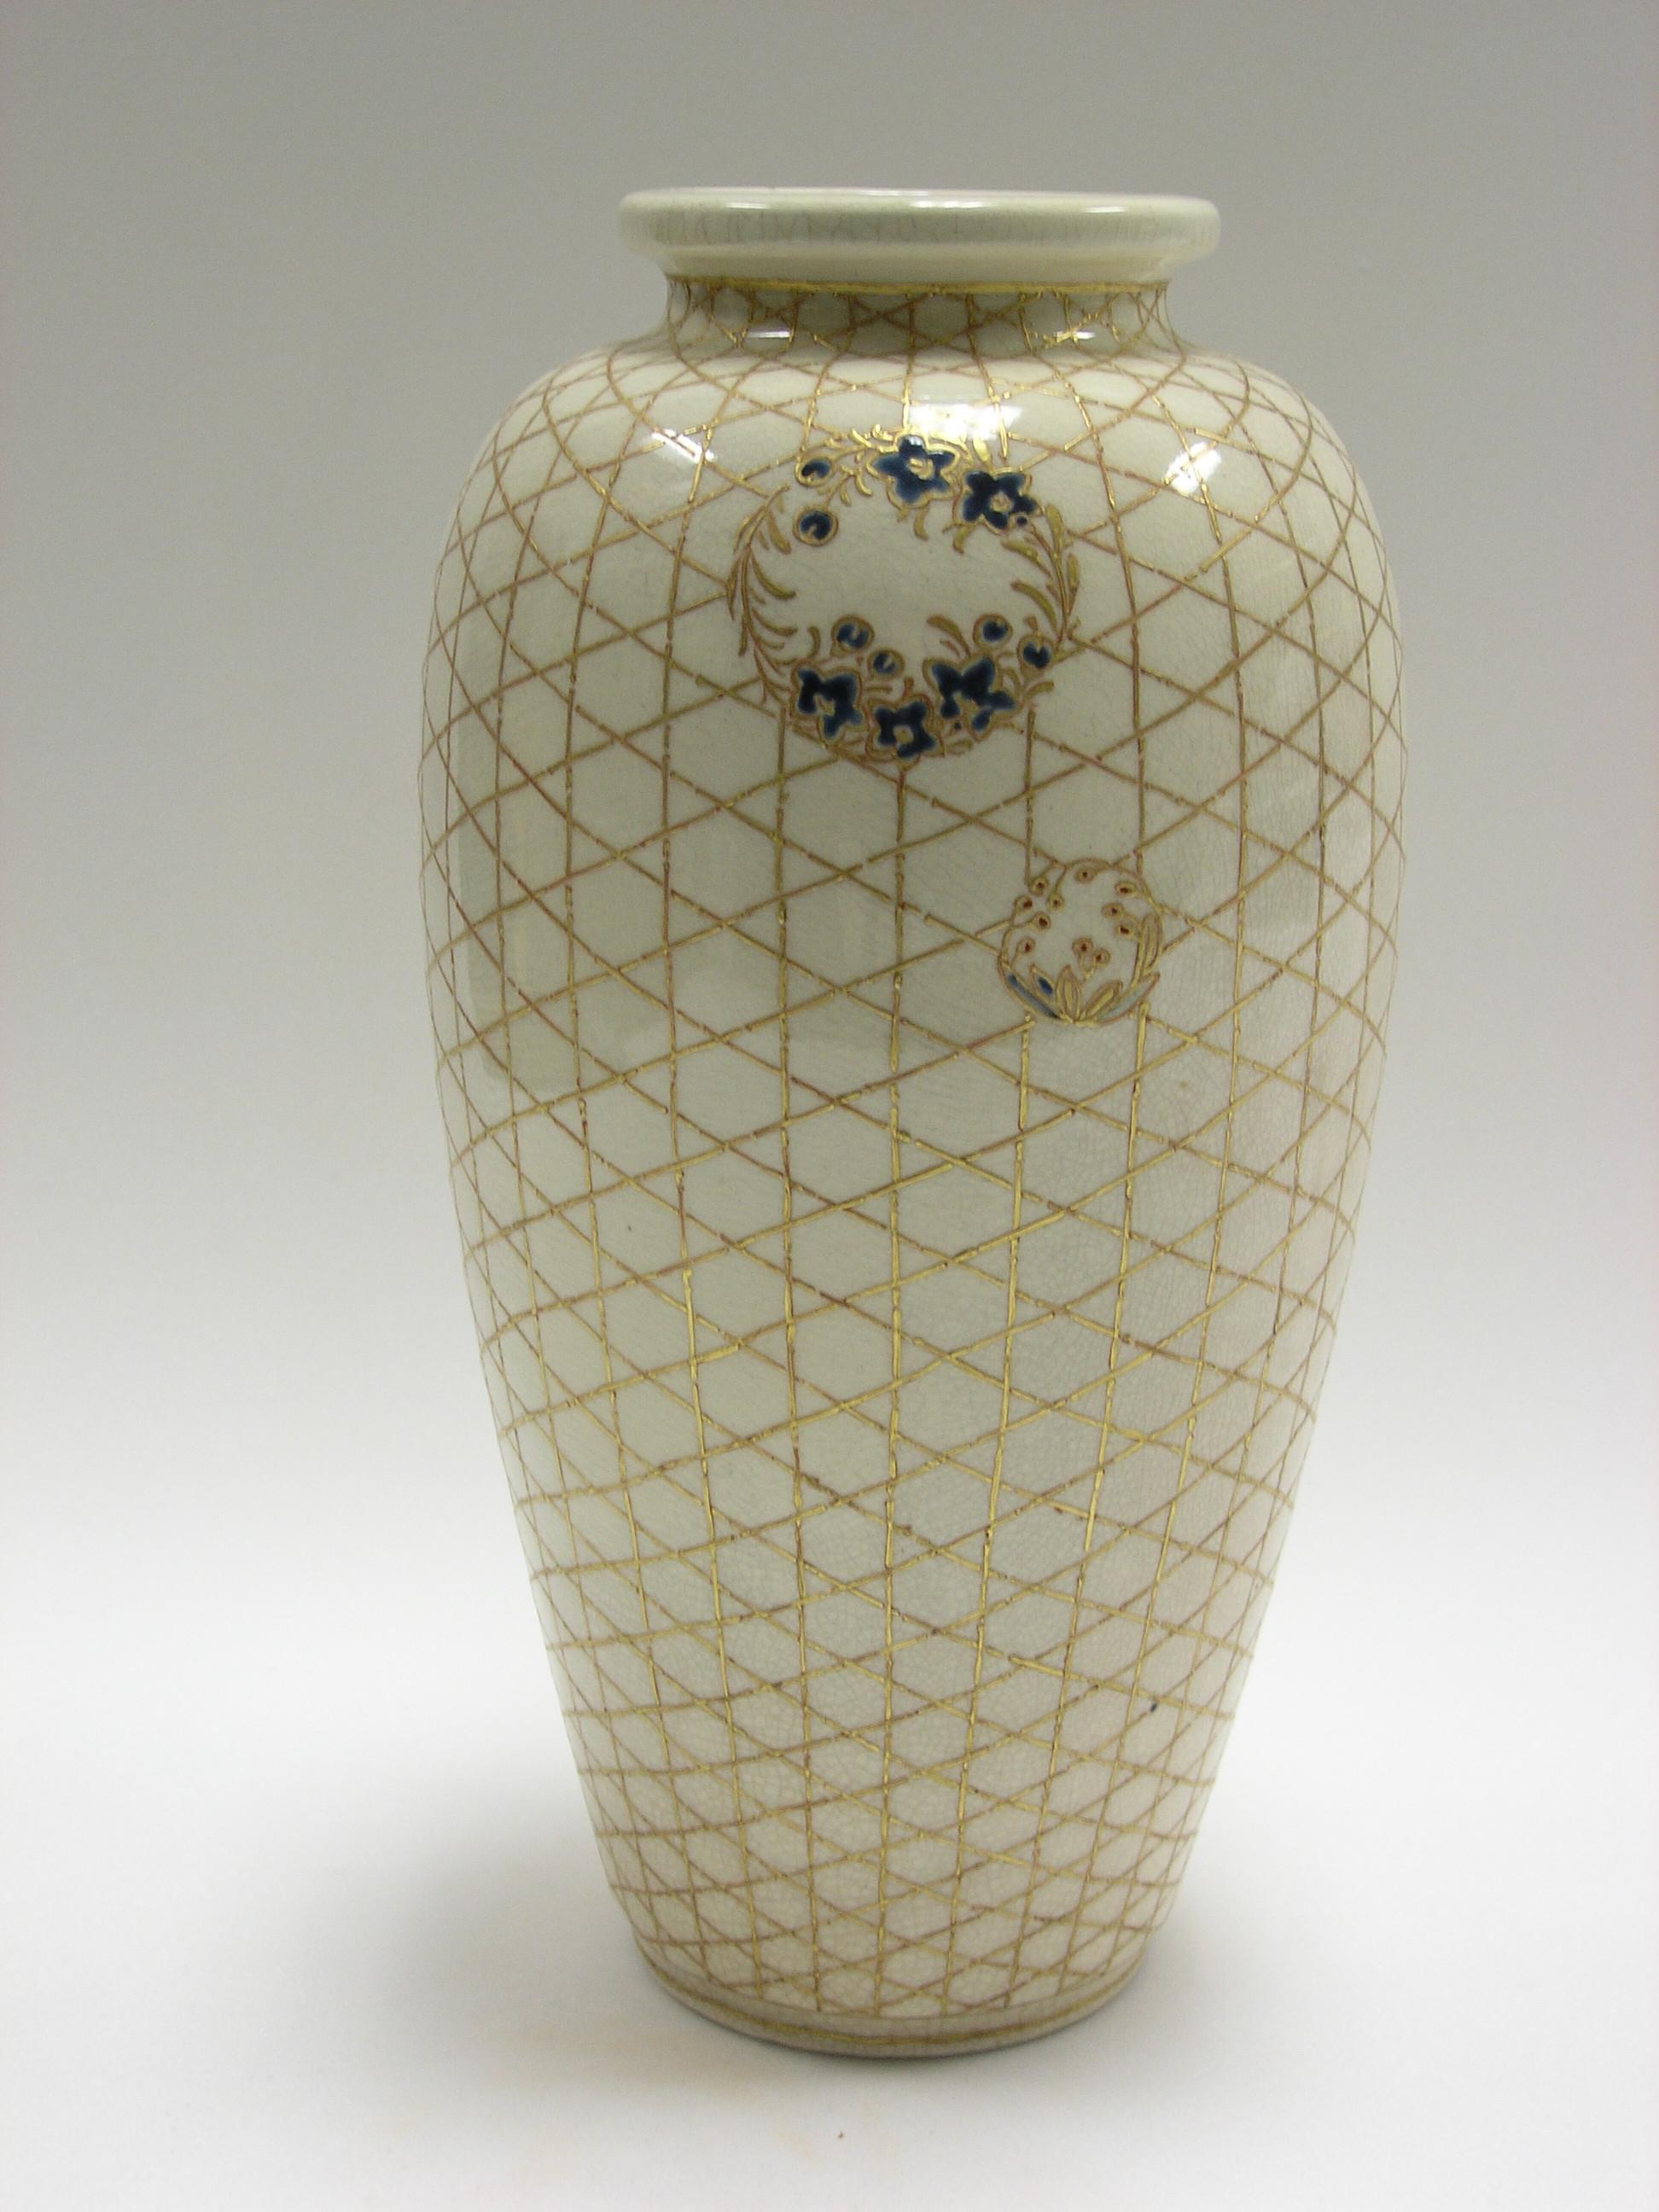 gold satsuma vase of filevase am 1980 257 4 wikimedia commons in filevase am 1980 257 4